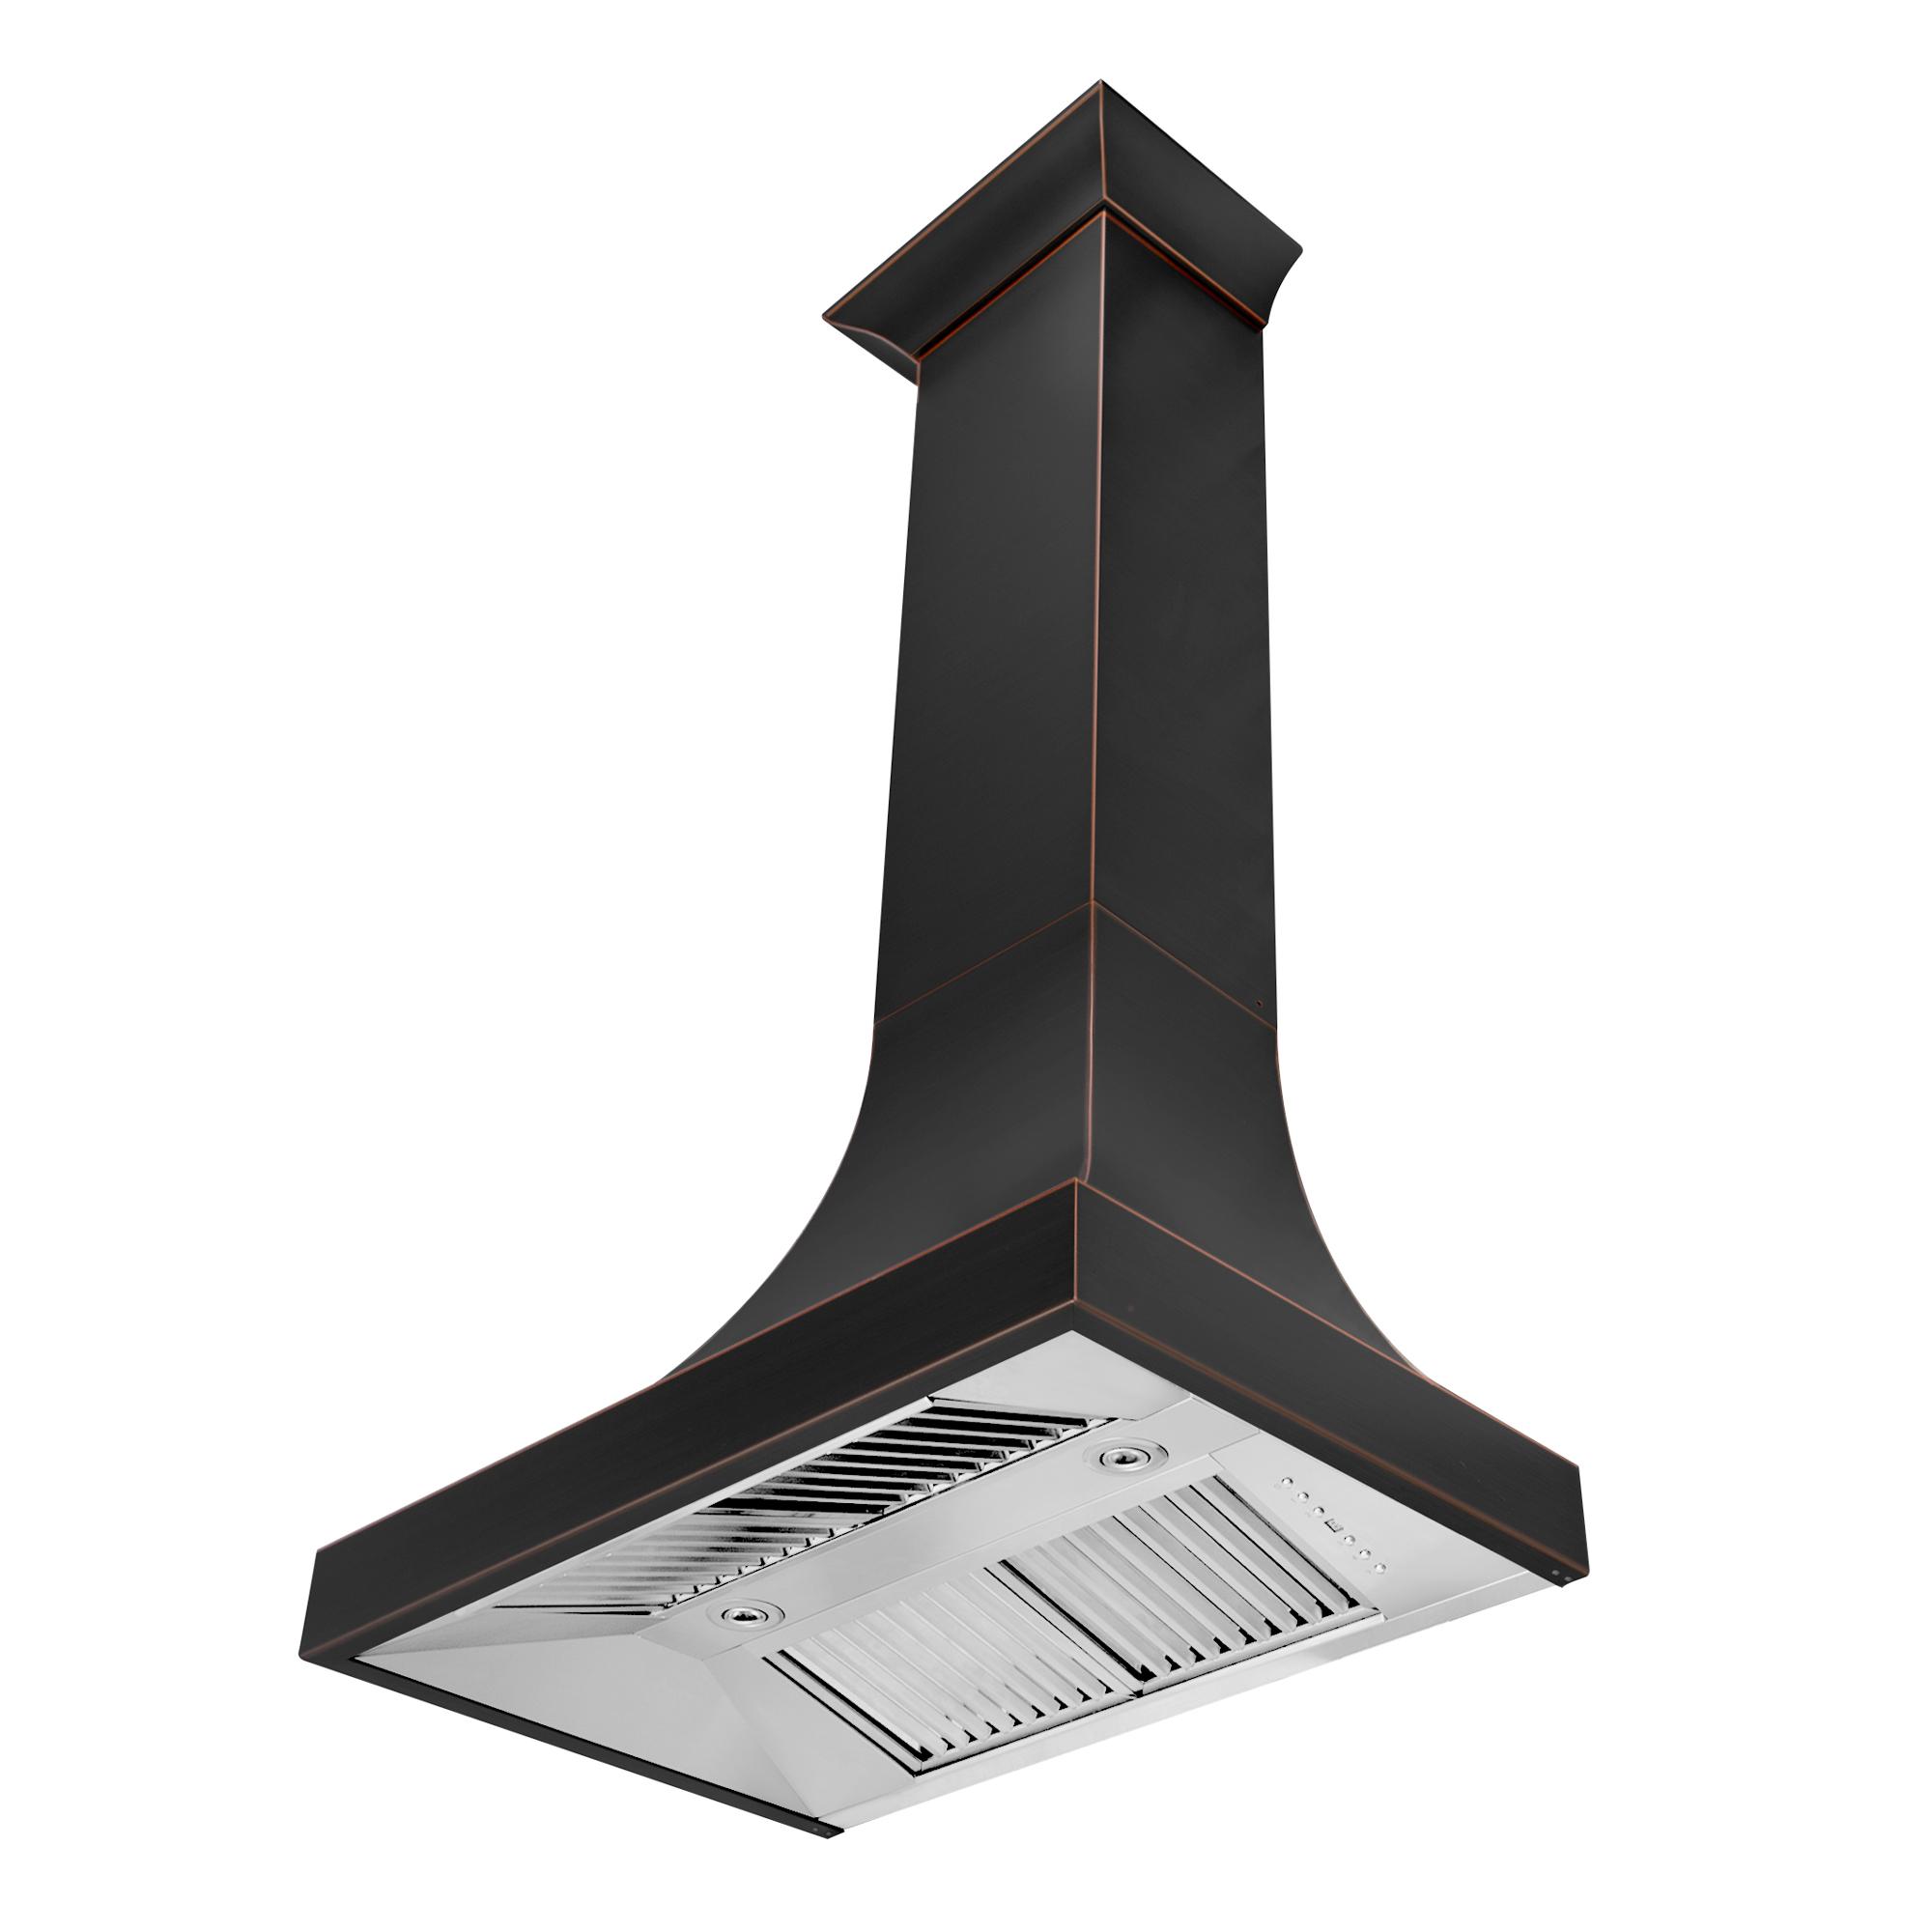 zline-bronze-wall-mounted-range-hood-8632B-kitchen-1-wb.jpg